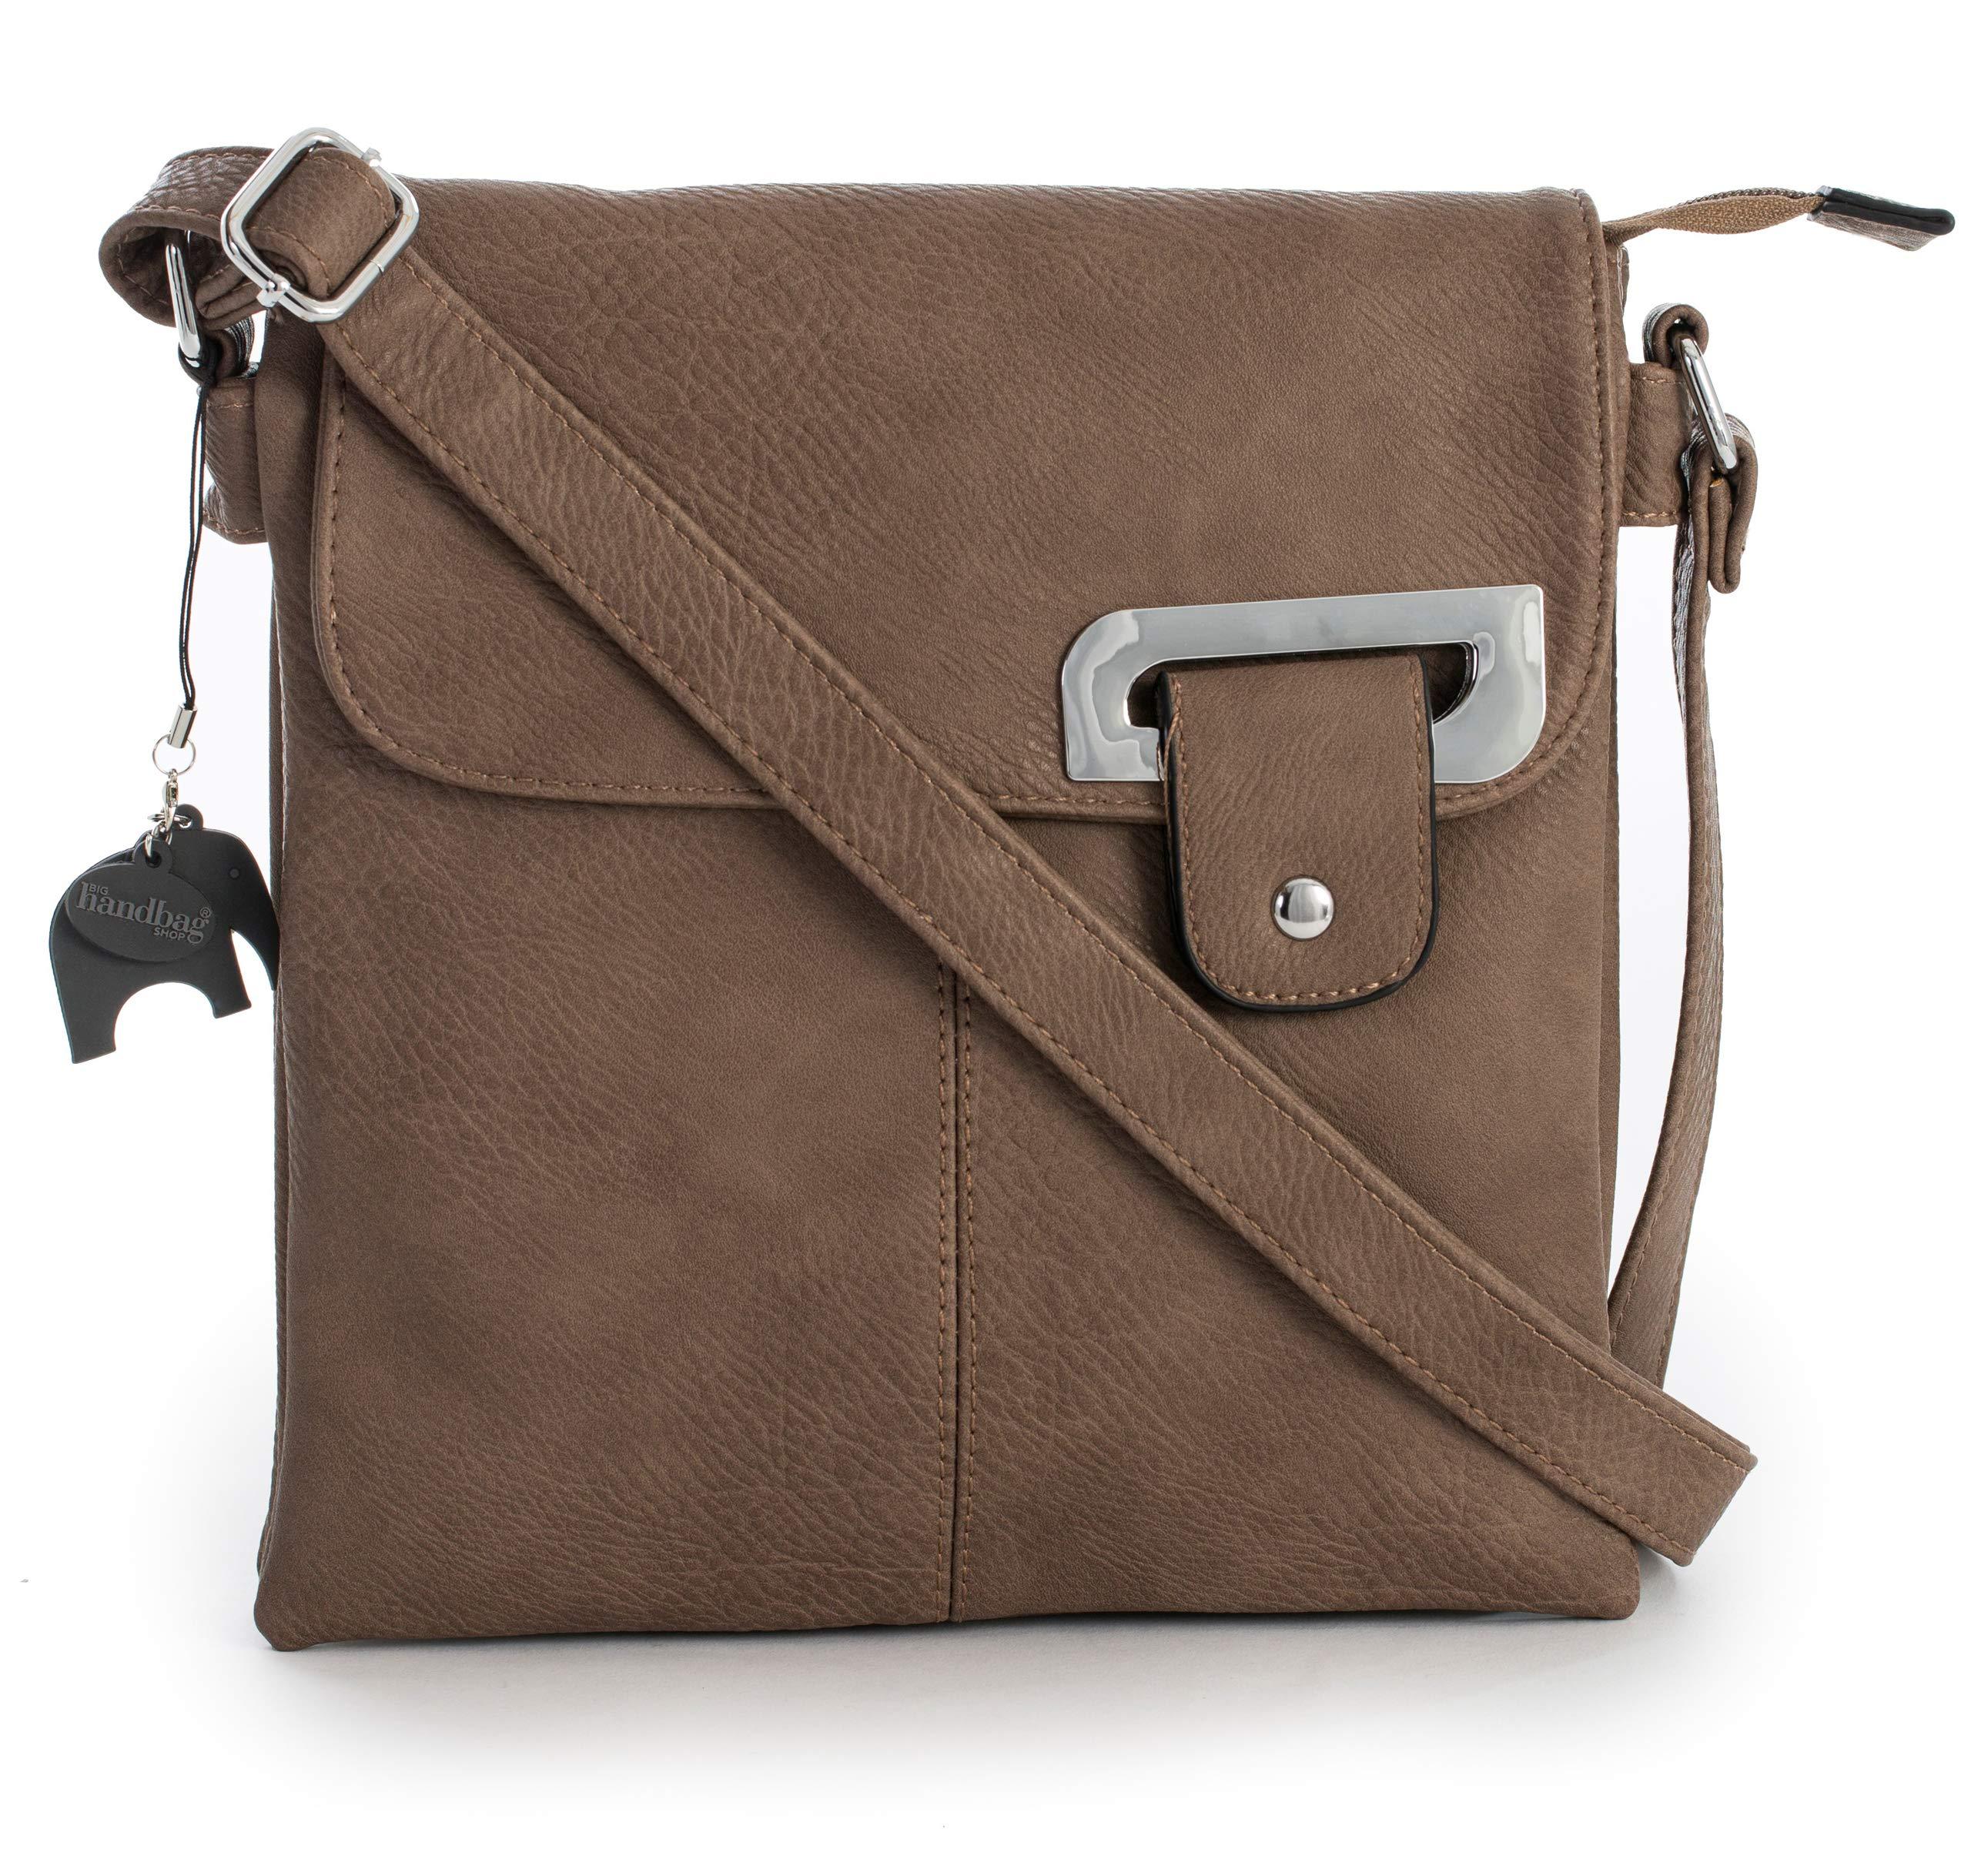 b23a014536c6 Big Handbag Shop Womens Medium Trendy Messenger Cross Body Shoulder Bag  With a Branded Protective Storage